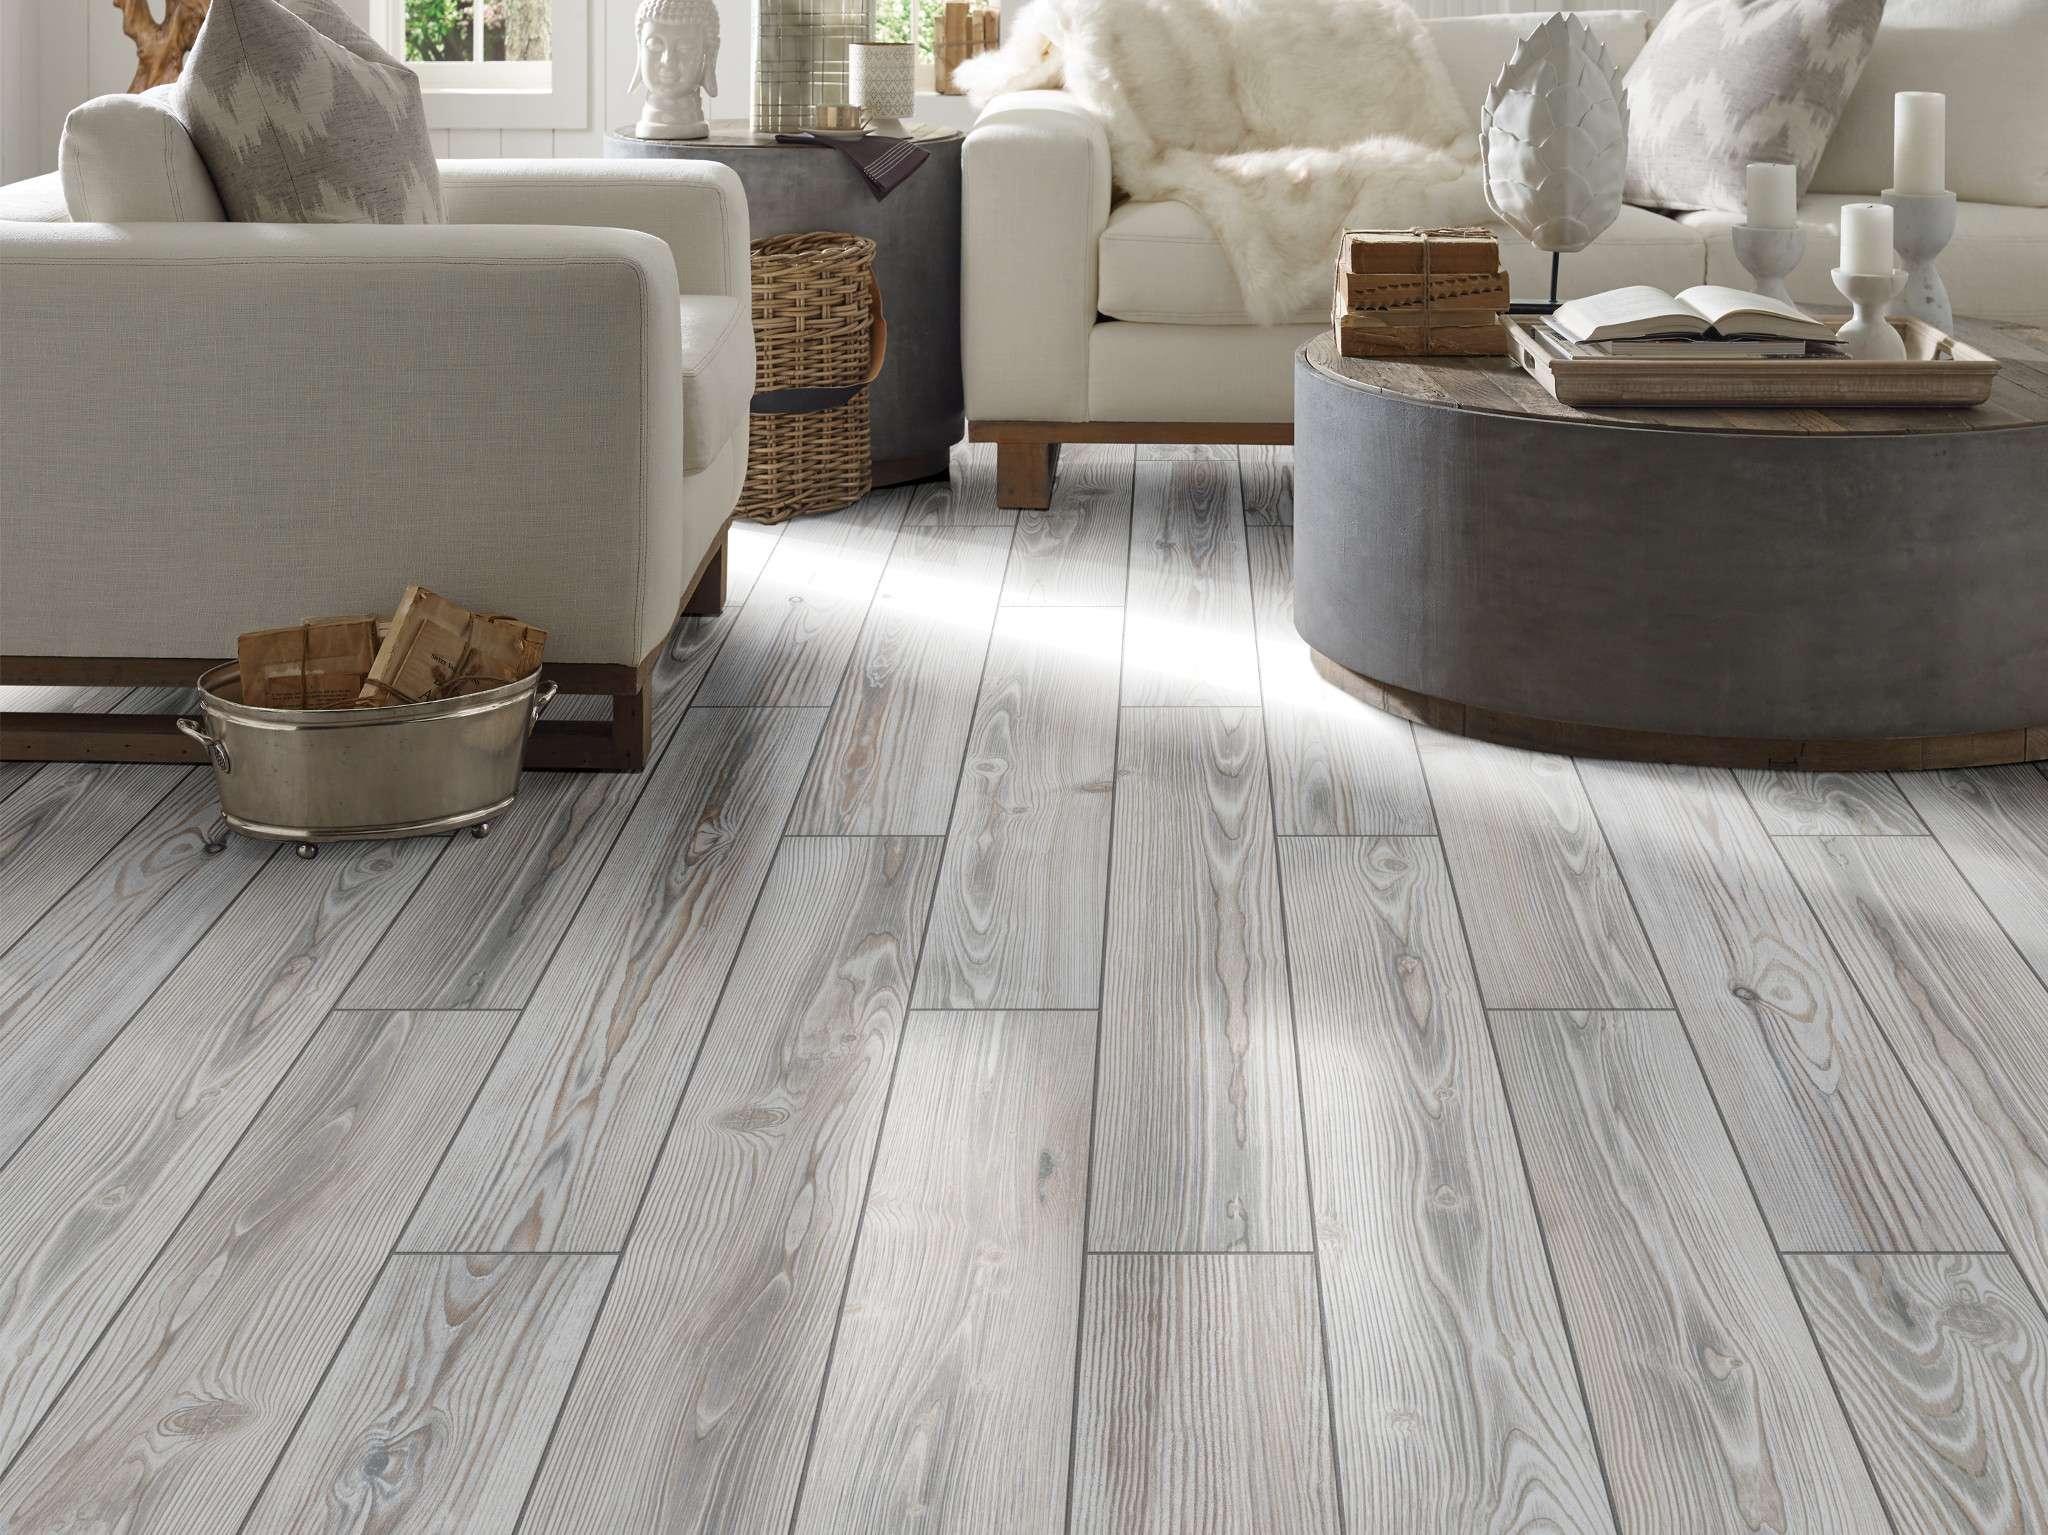 Traditions 6x36 200ts Platinum Ceramics, Shaw Tile Look Laminate Flooring